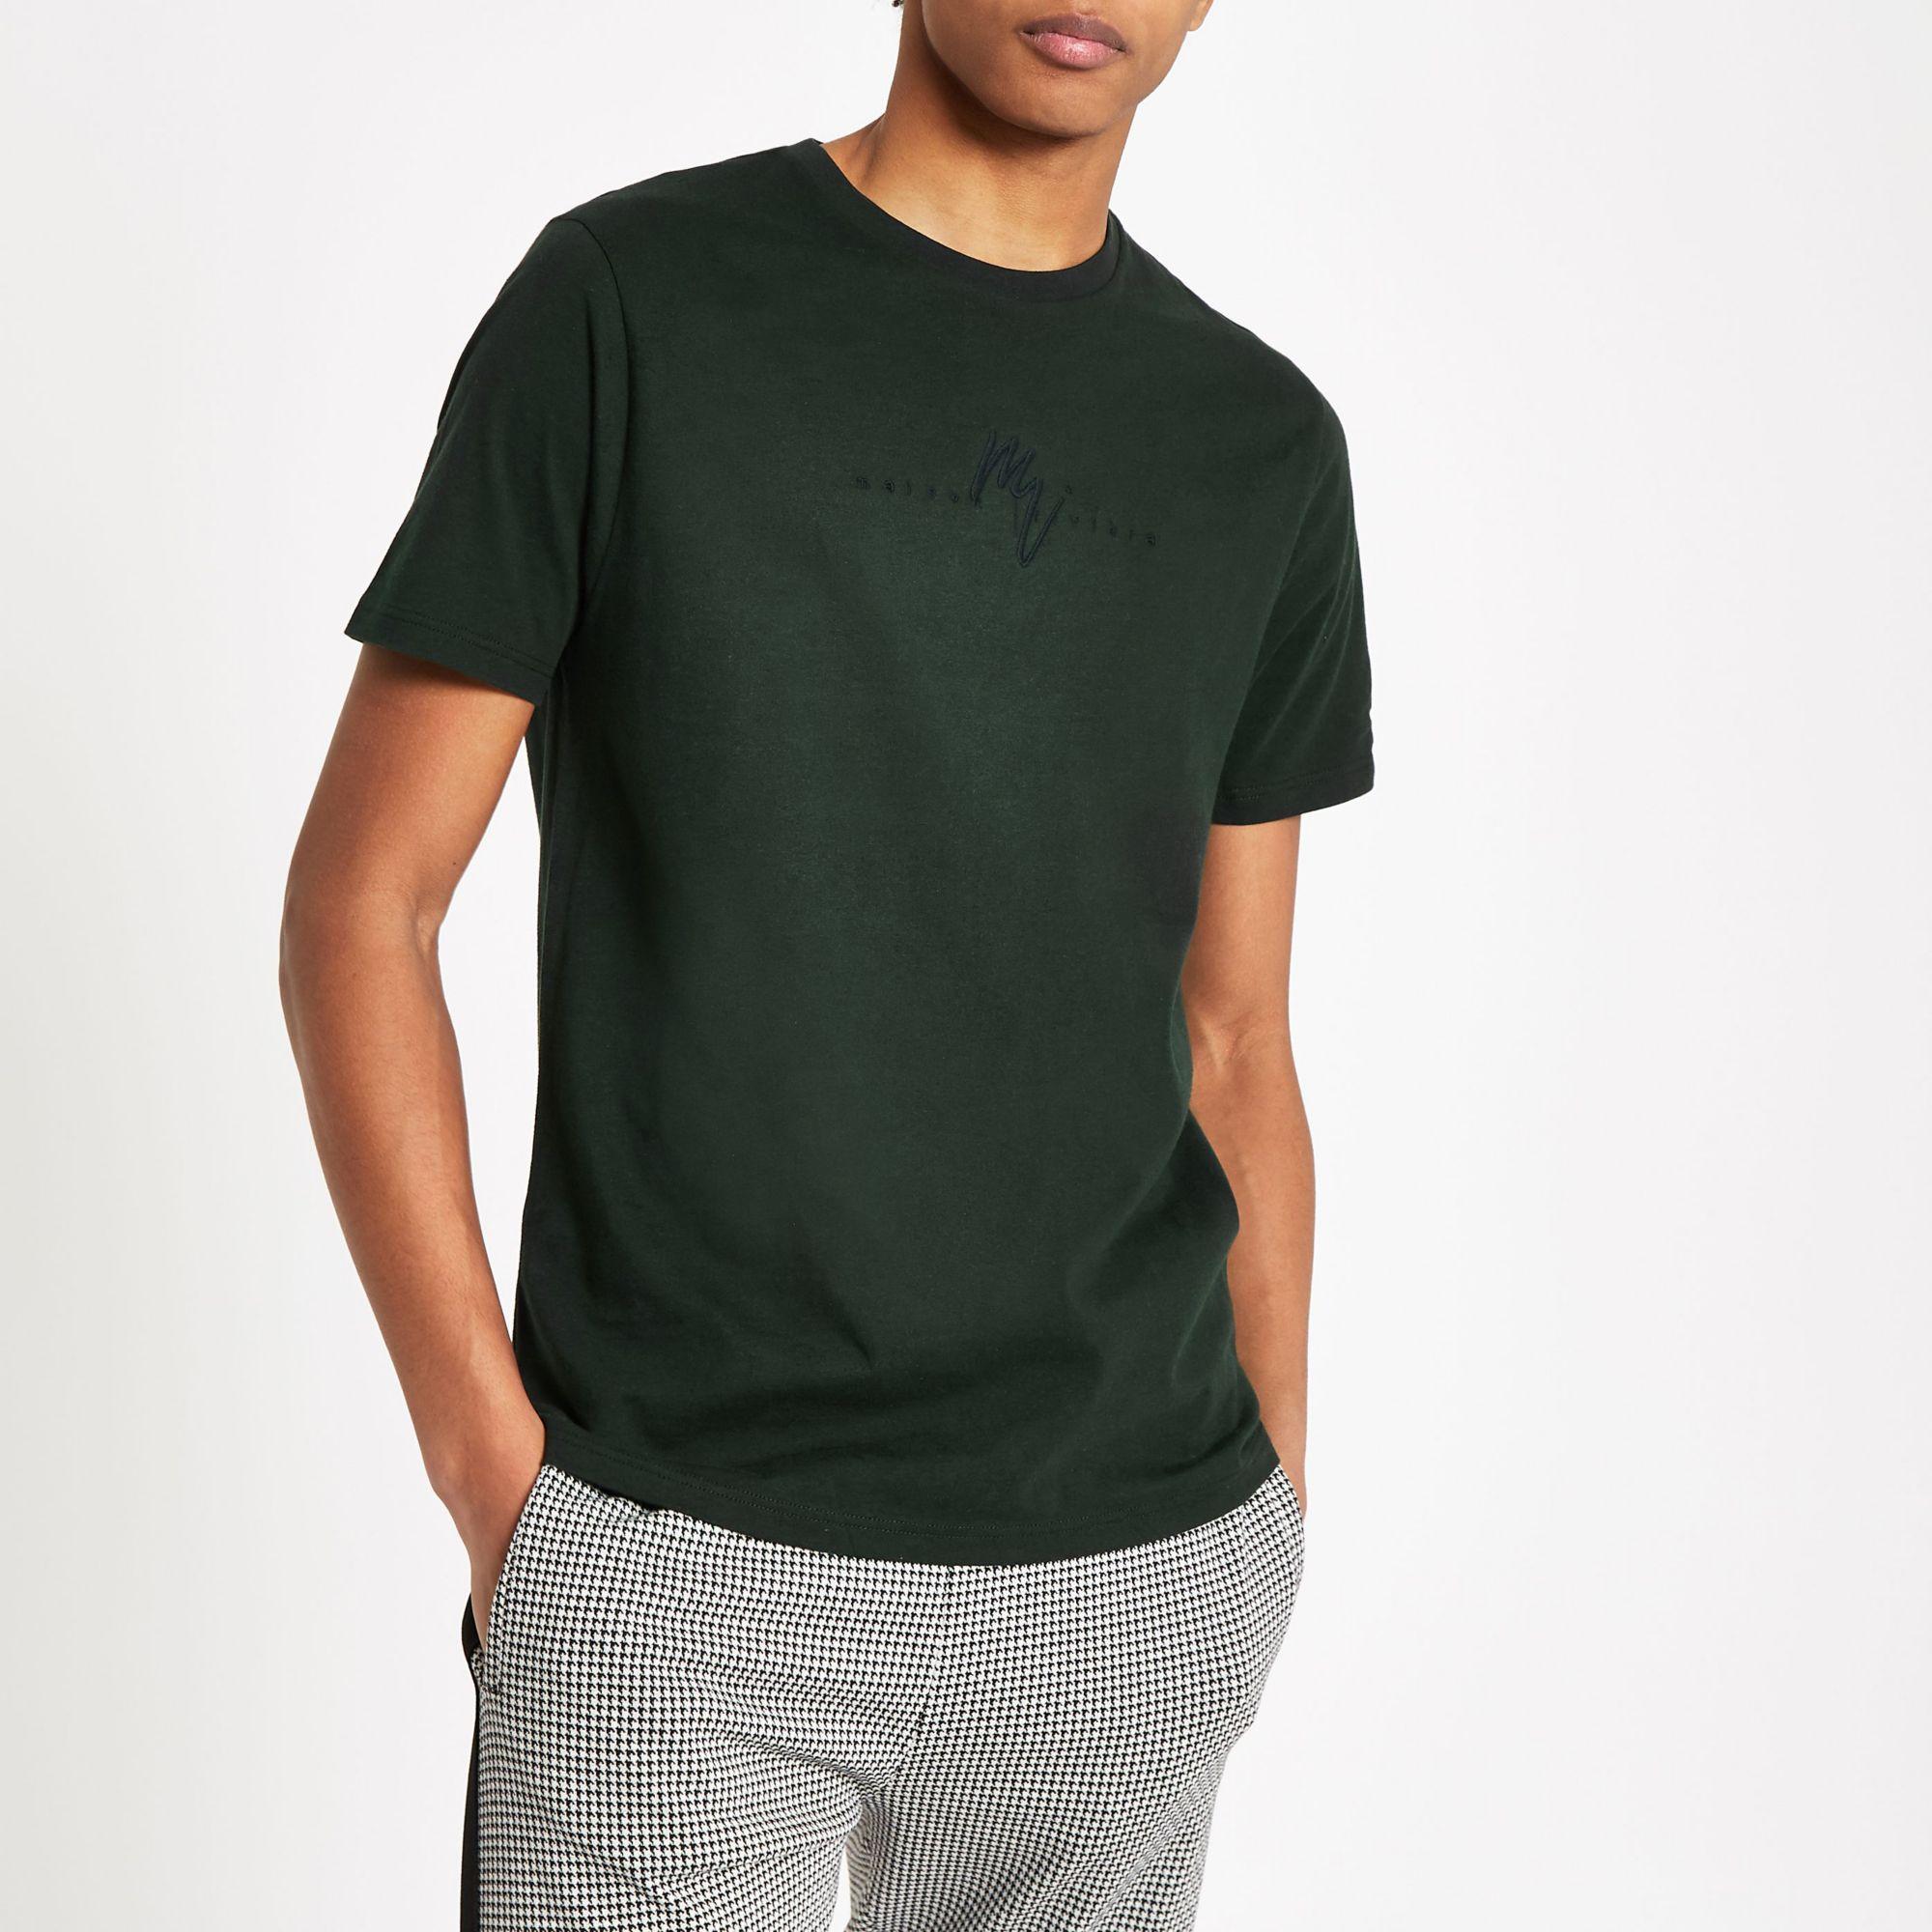 c814af911f21ef Lyst - River Island  maison Riviera  Slim Fit T-shirt in Green for Men